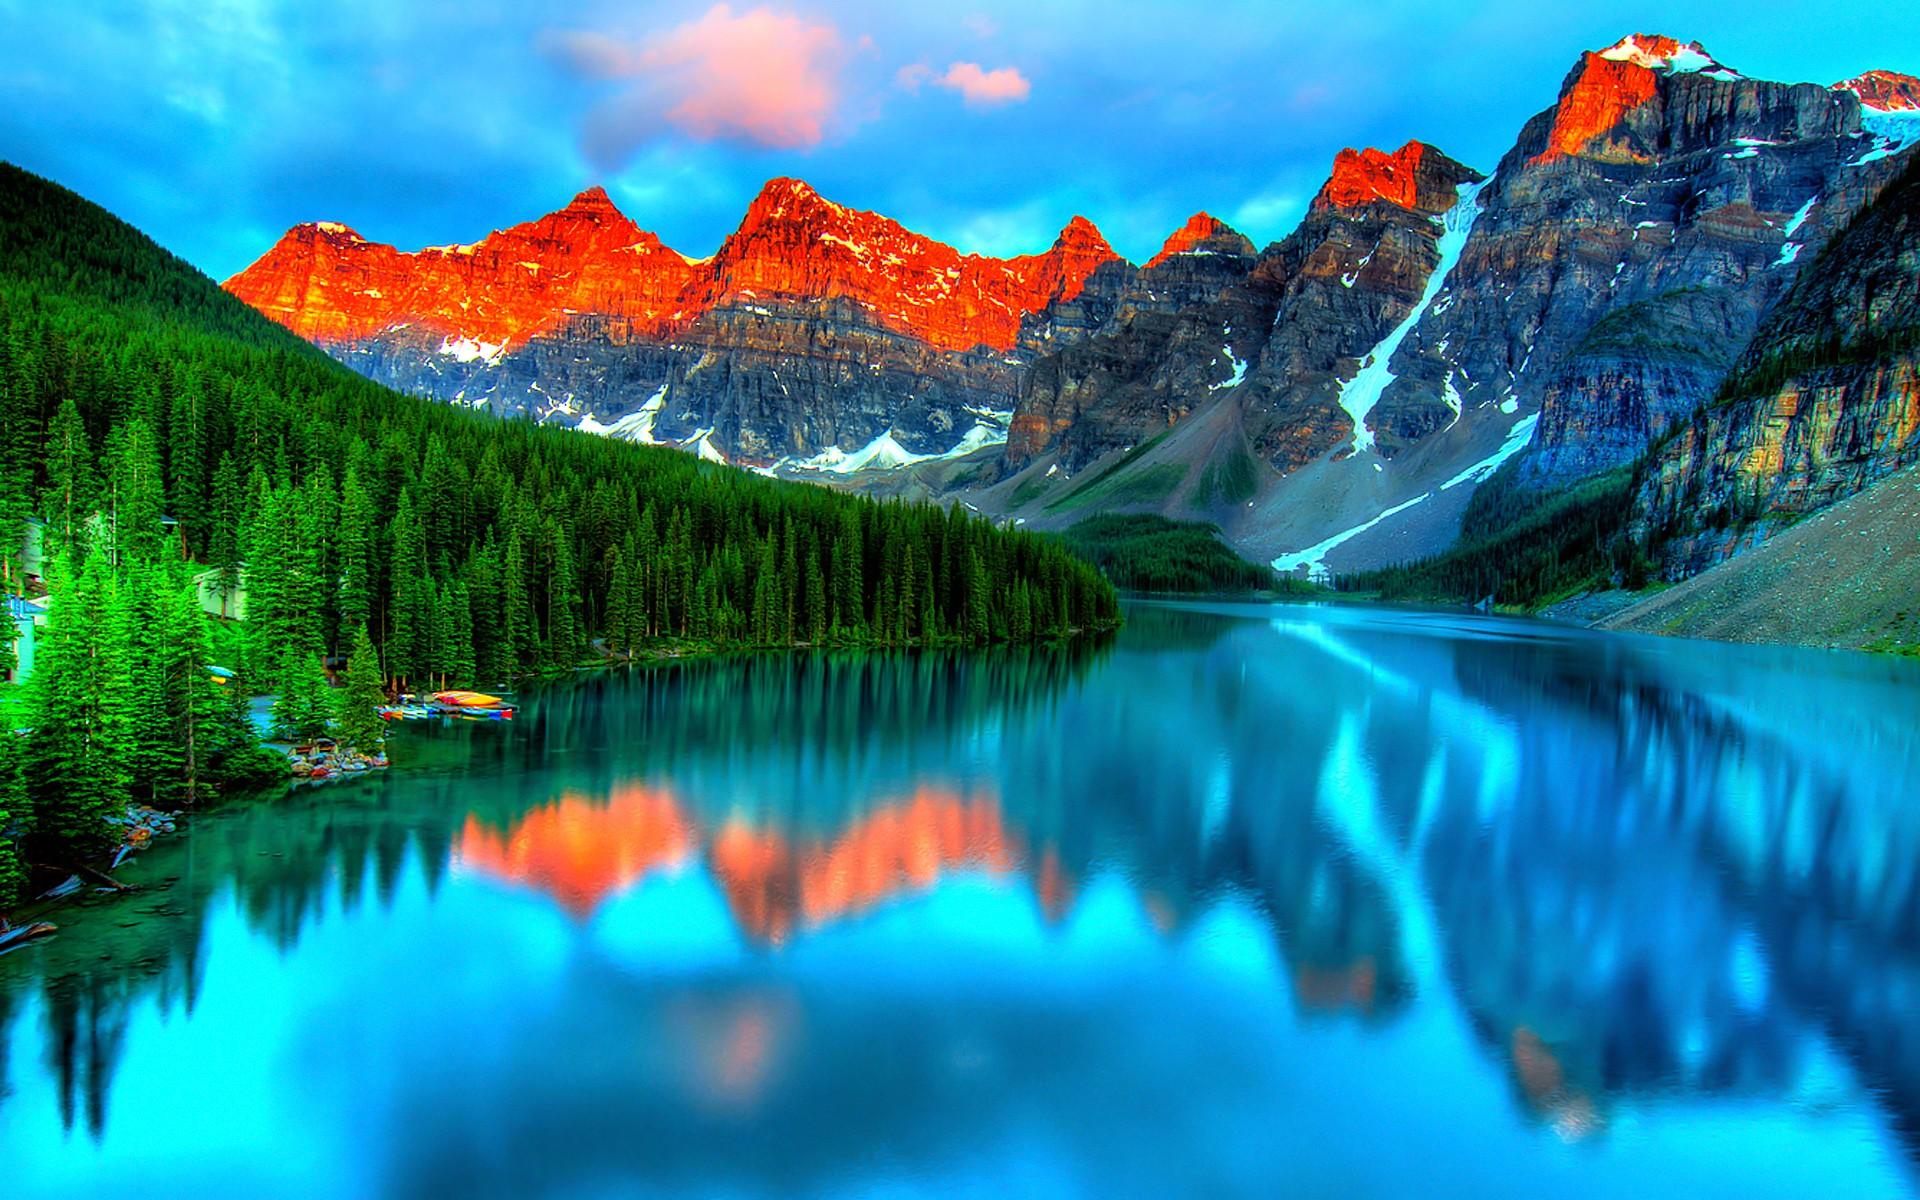 Fall Mountain Scenery Wallpaper Free Photo Beautiful Scenery Scenic Scenery Green